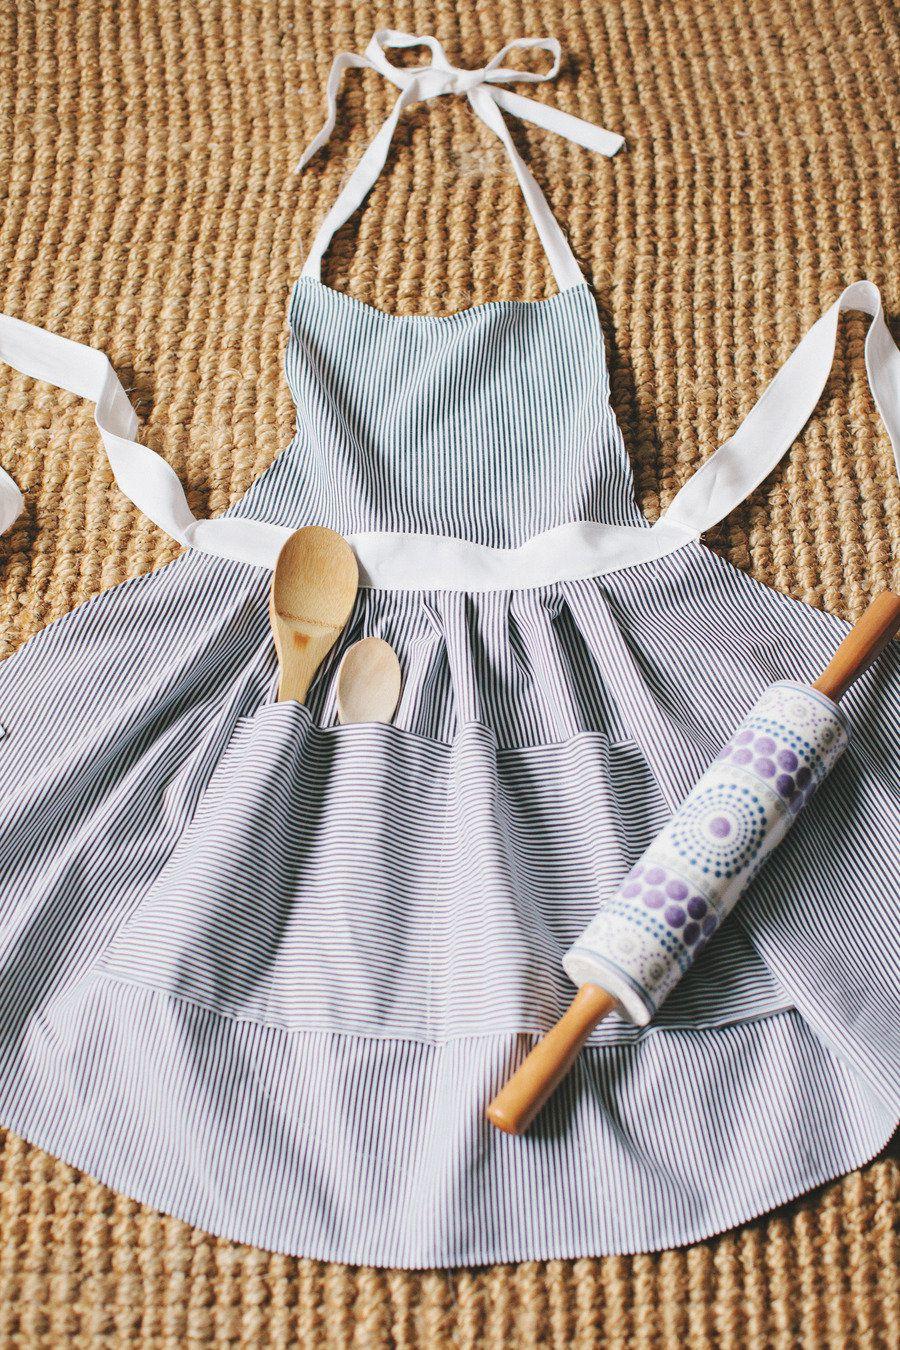 diy hostess apron